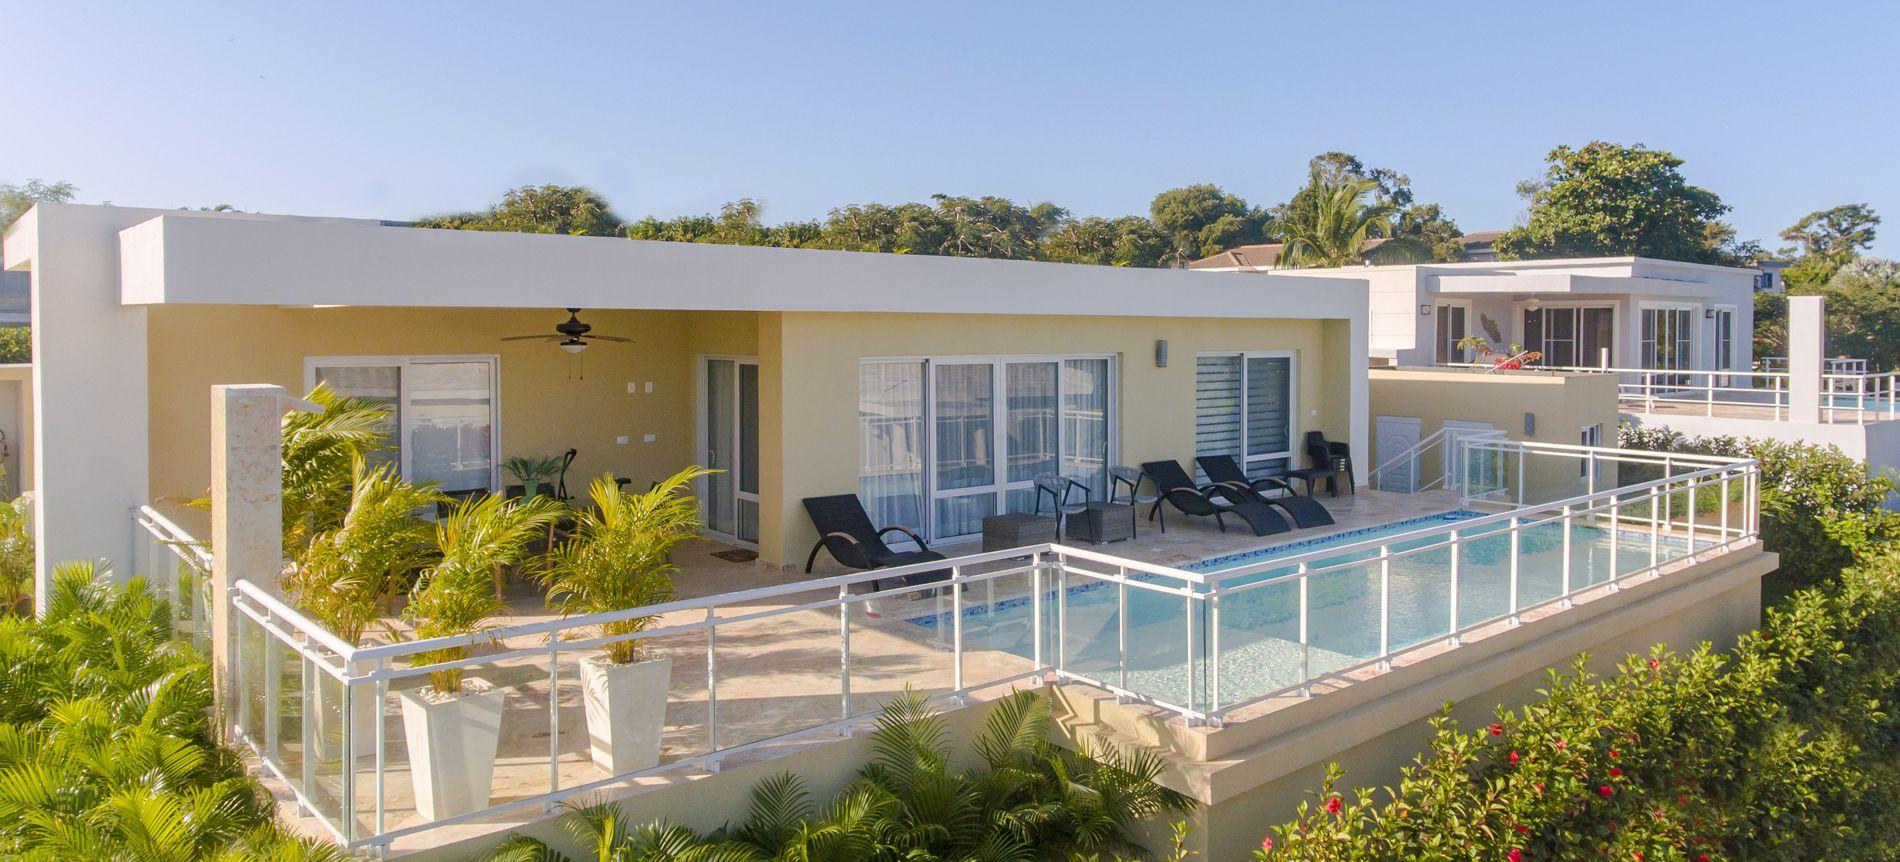 Villa At Casa Linda